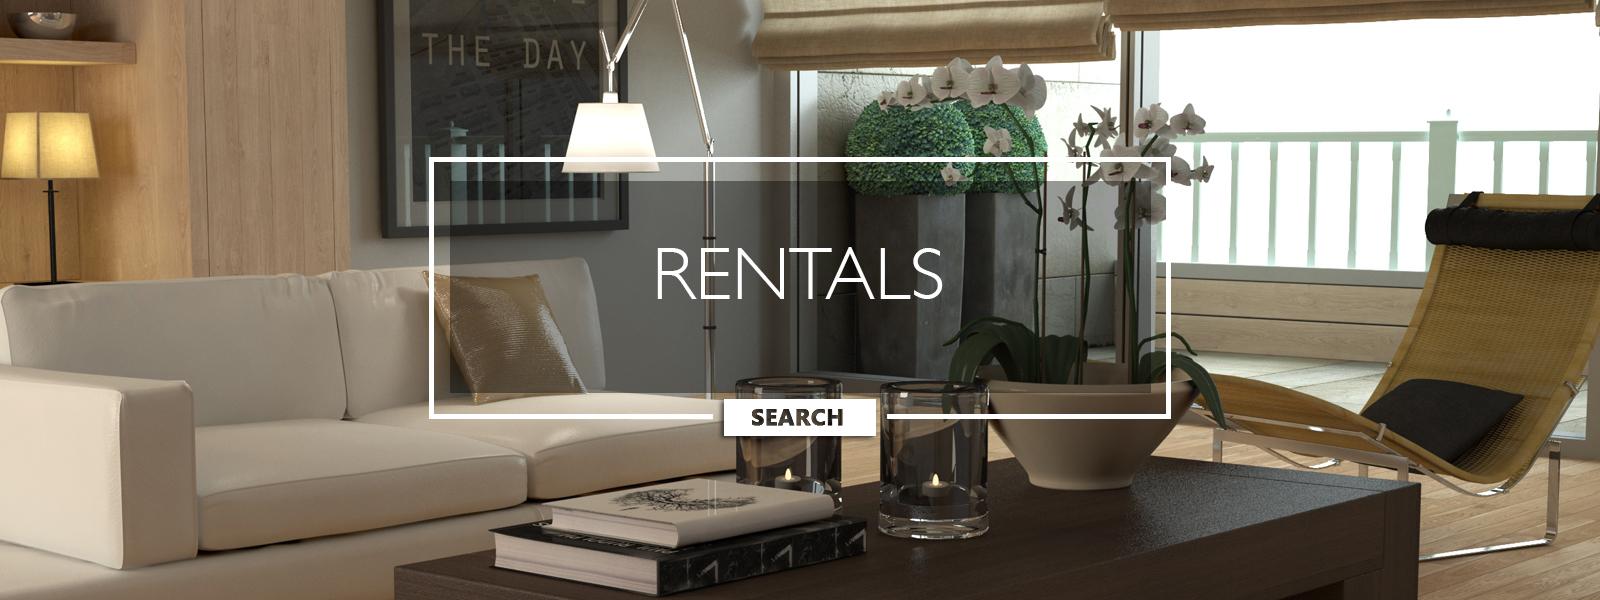 RentalPage